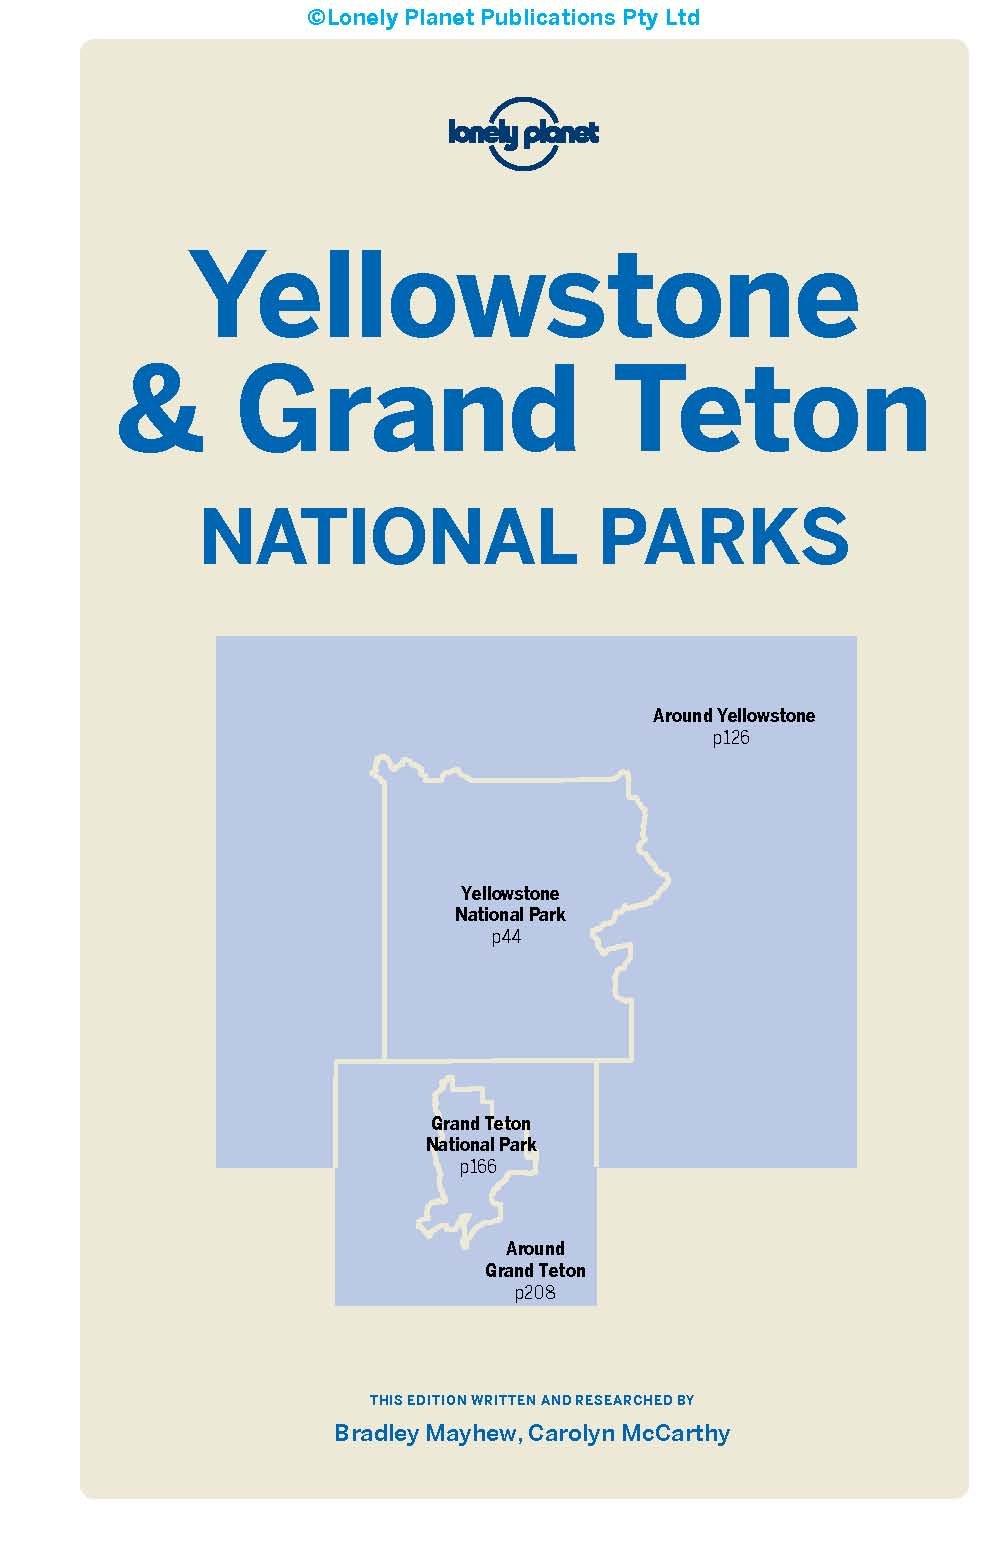 worksheet Yellowstone National Park Worksheets lonely planet yellowstone grand teton national parks travel guide bradley mayhew carolyn mccarthy 978174